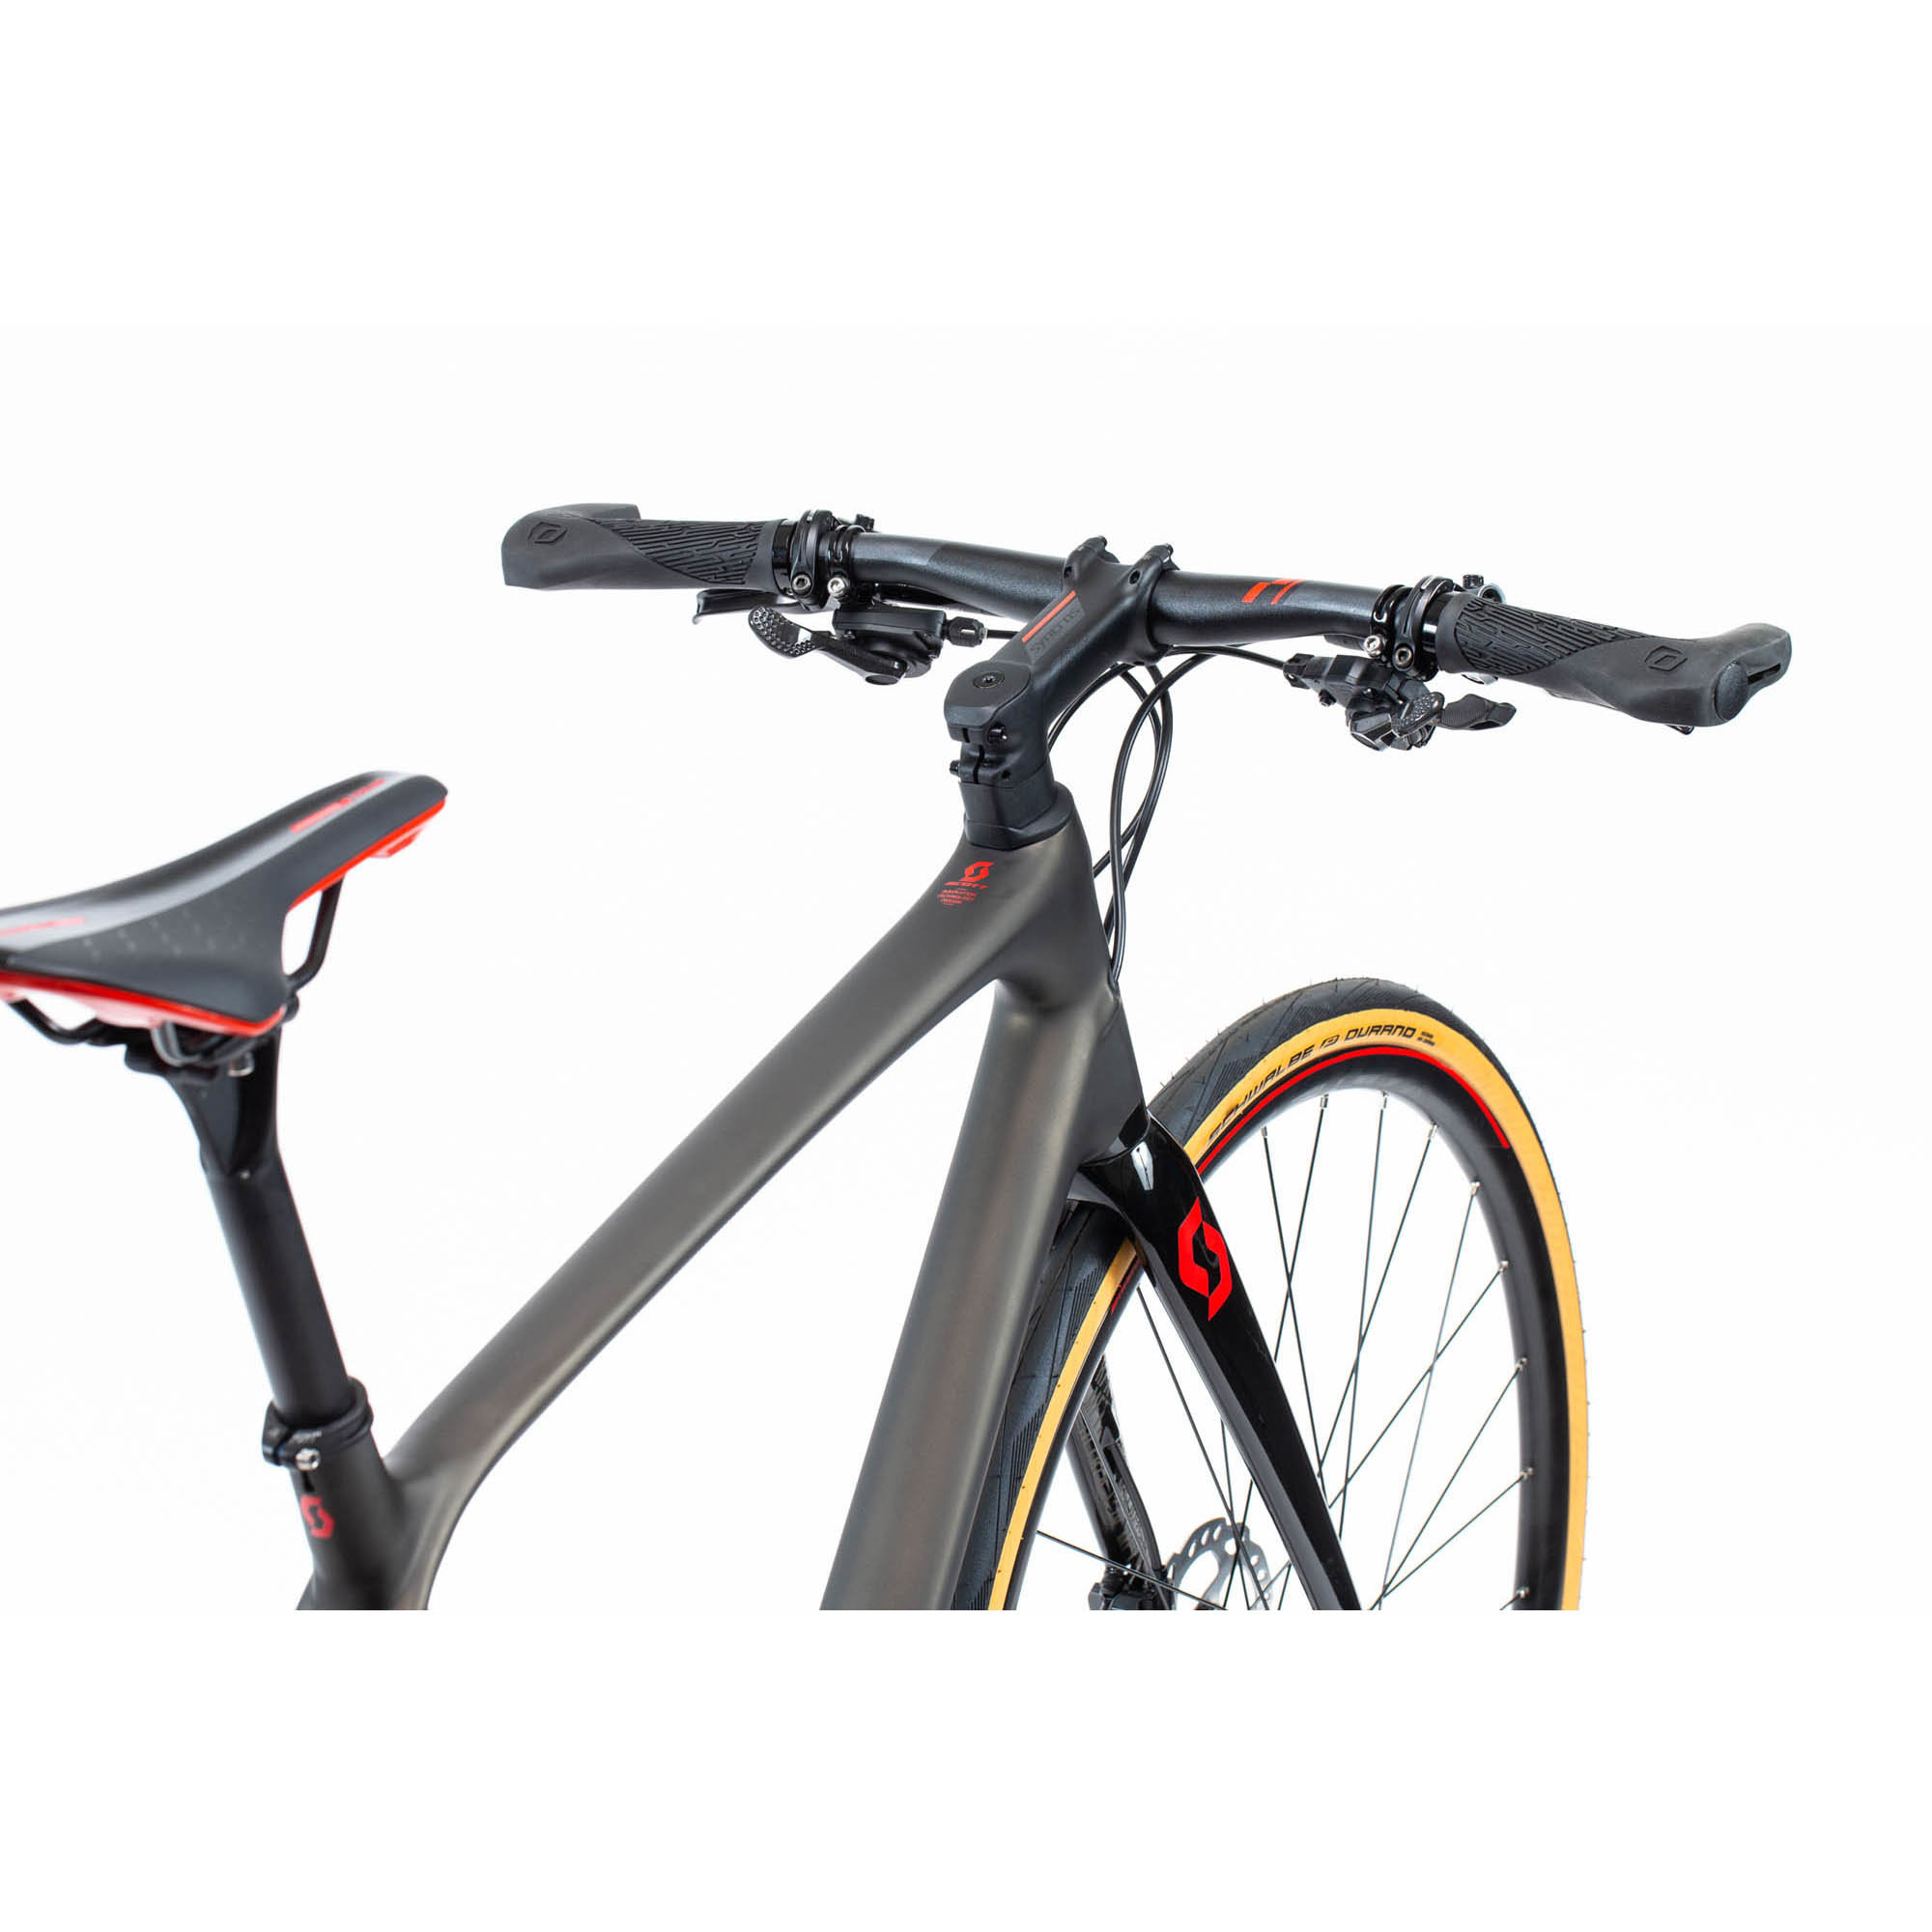 6a273c4af9e Scott Metrix 10 - Pro Cyclery